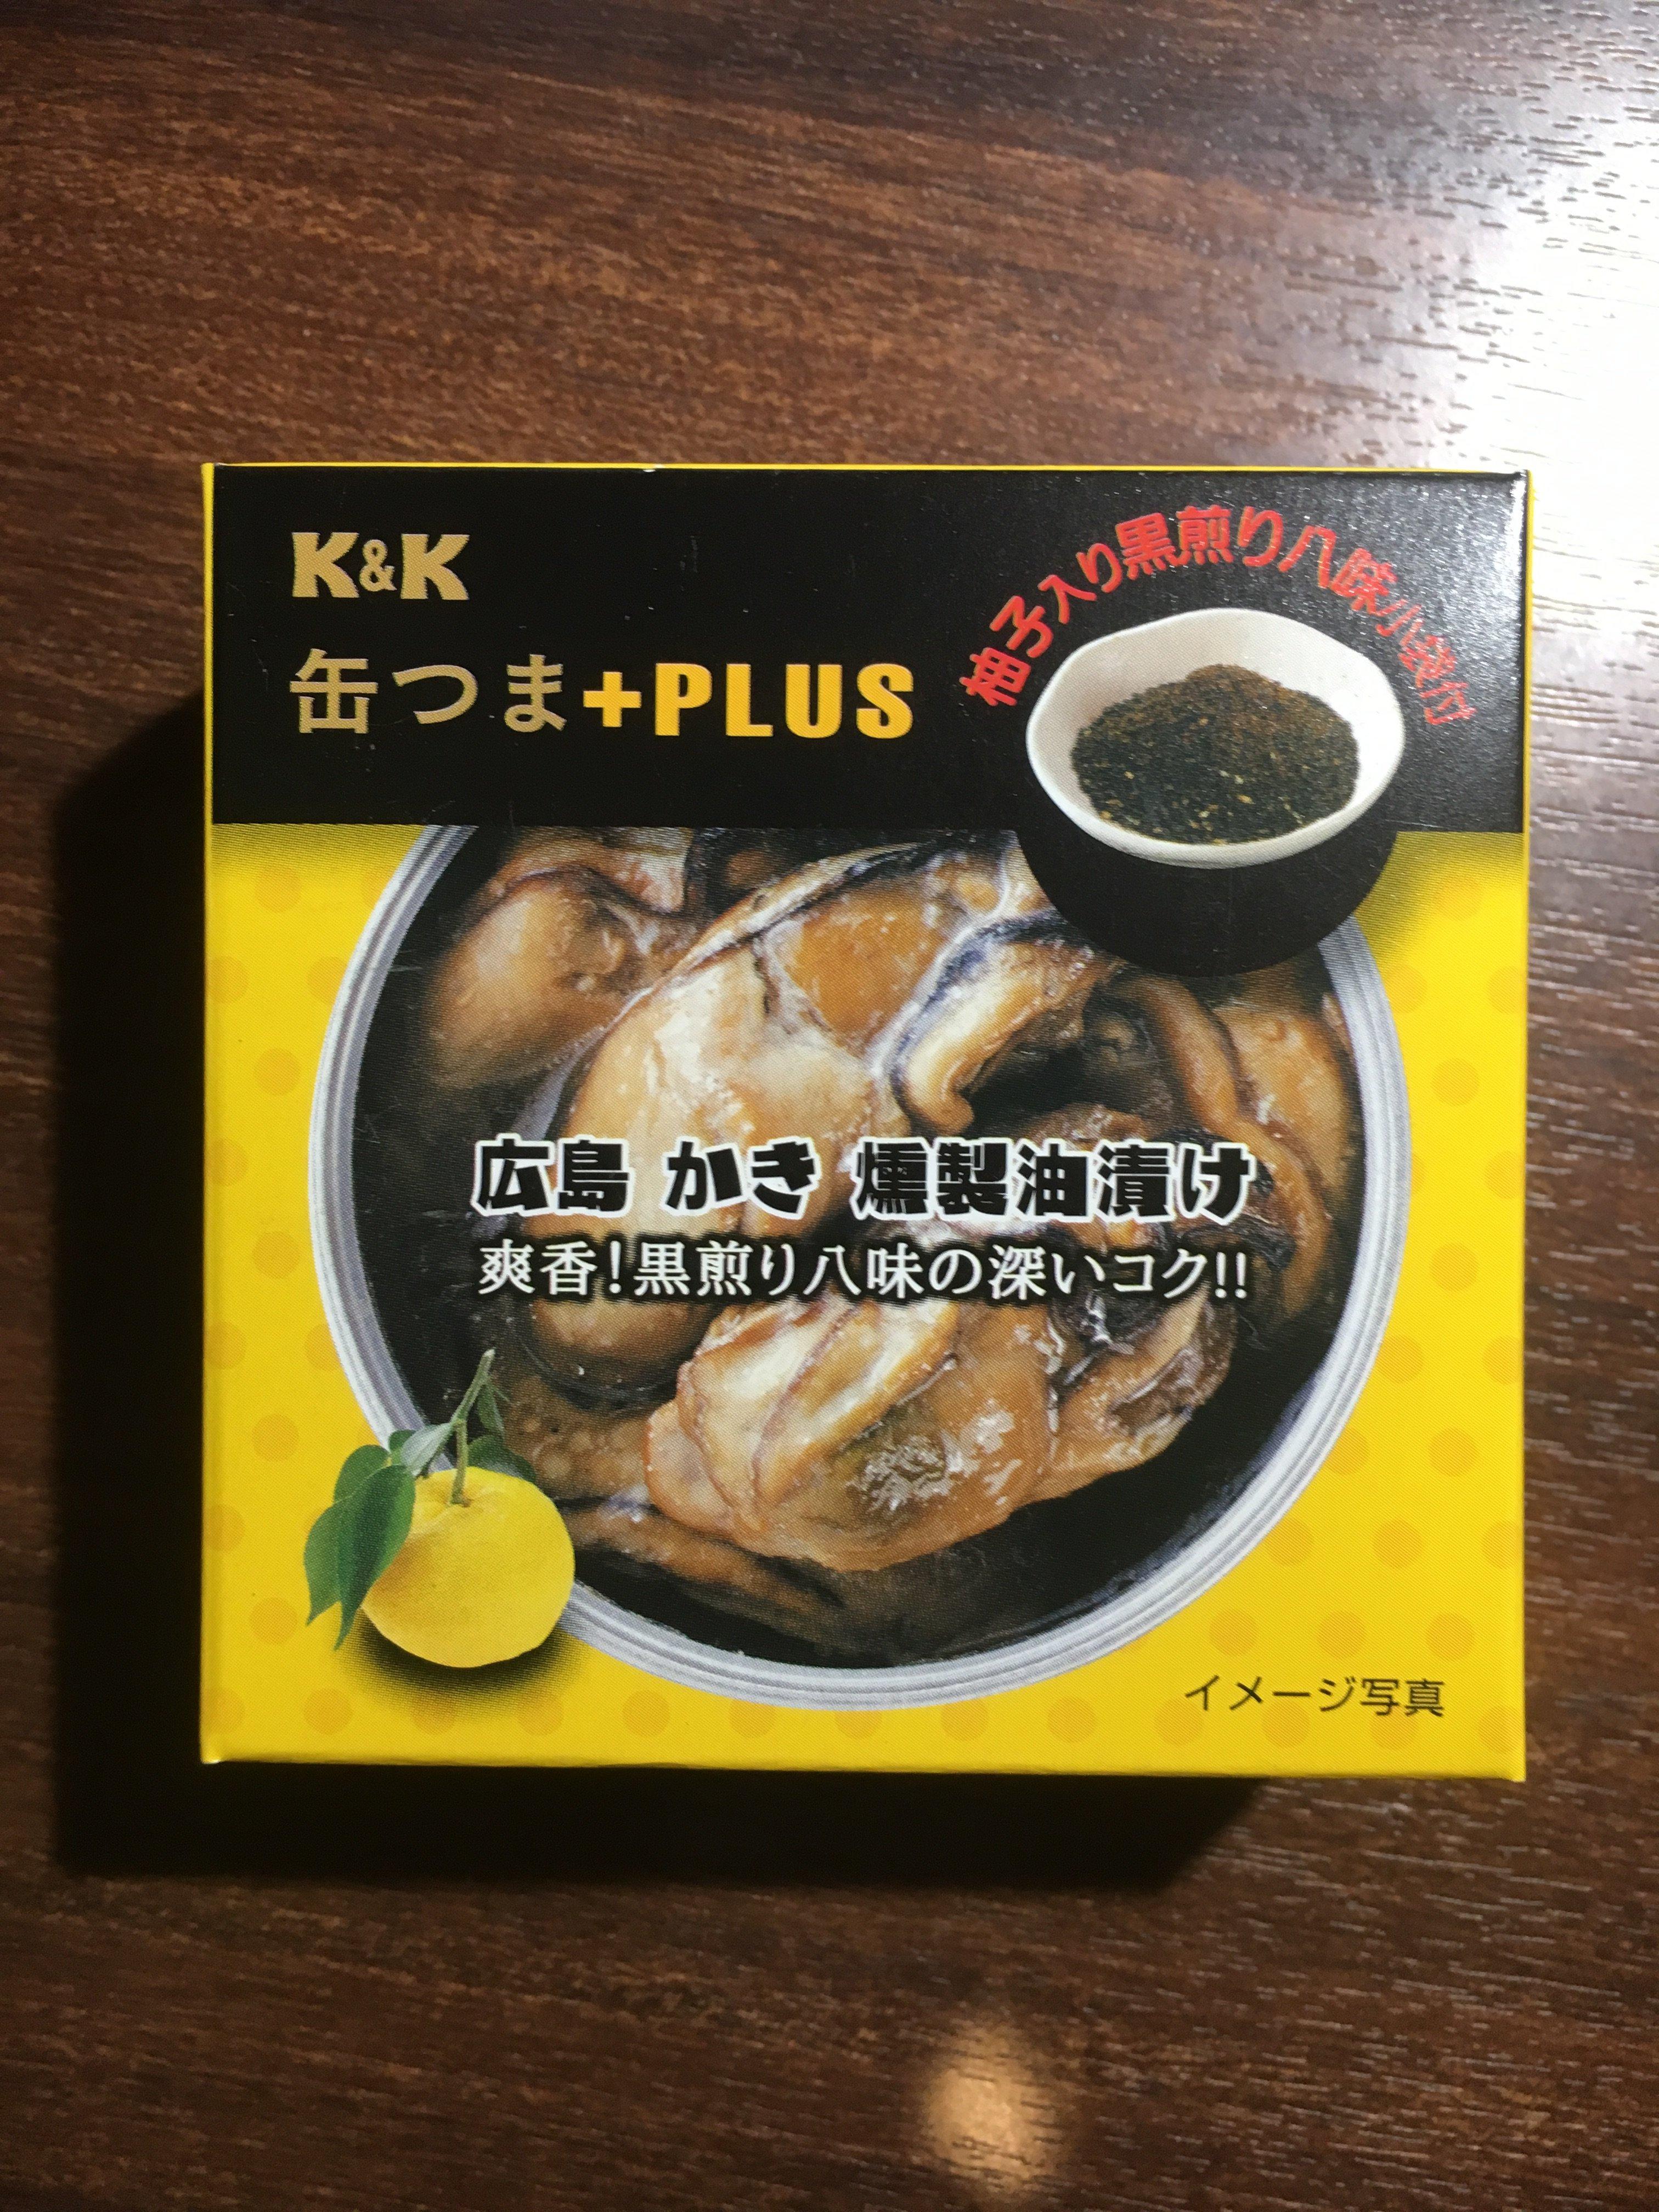 K&K 缶つま+PLUS 広島 かき 燻製油漬け 爽香!黒煎り八味の深いコク!! この八味はいいアクセントです